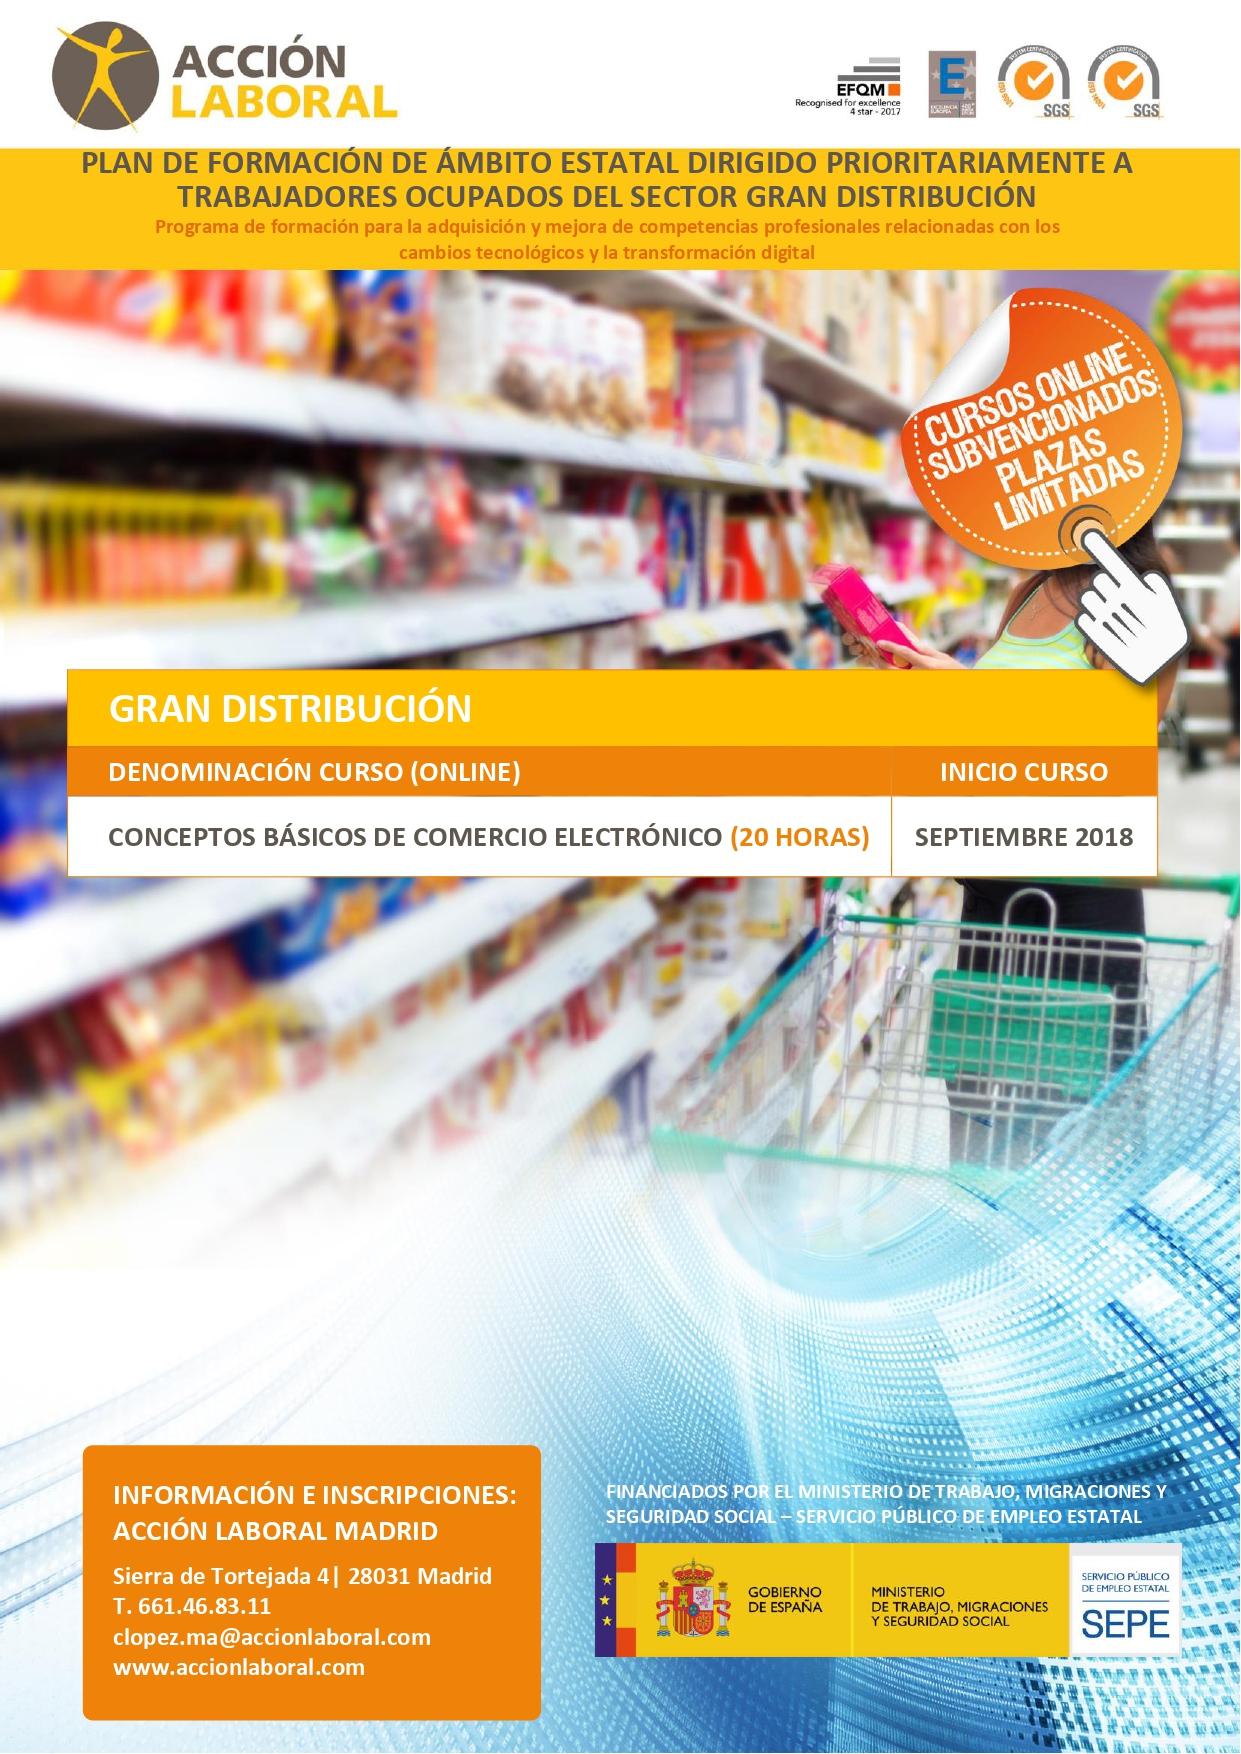 Curso Conceptos Básicos de Comercio Electrónico